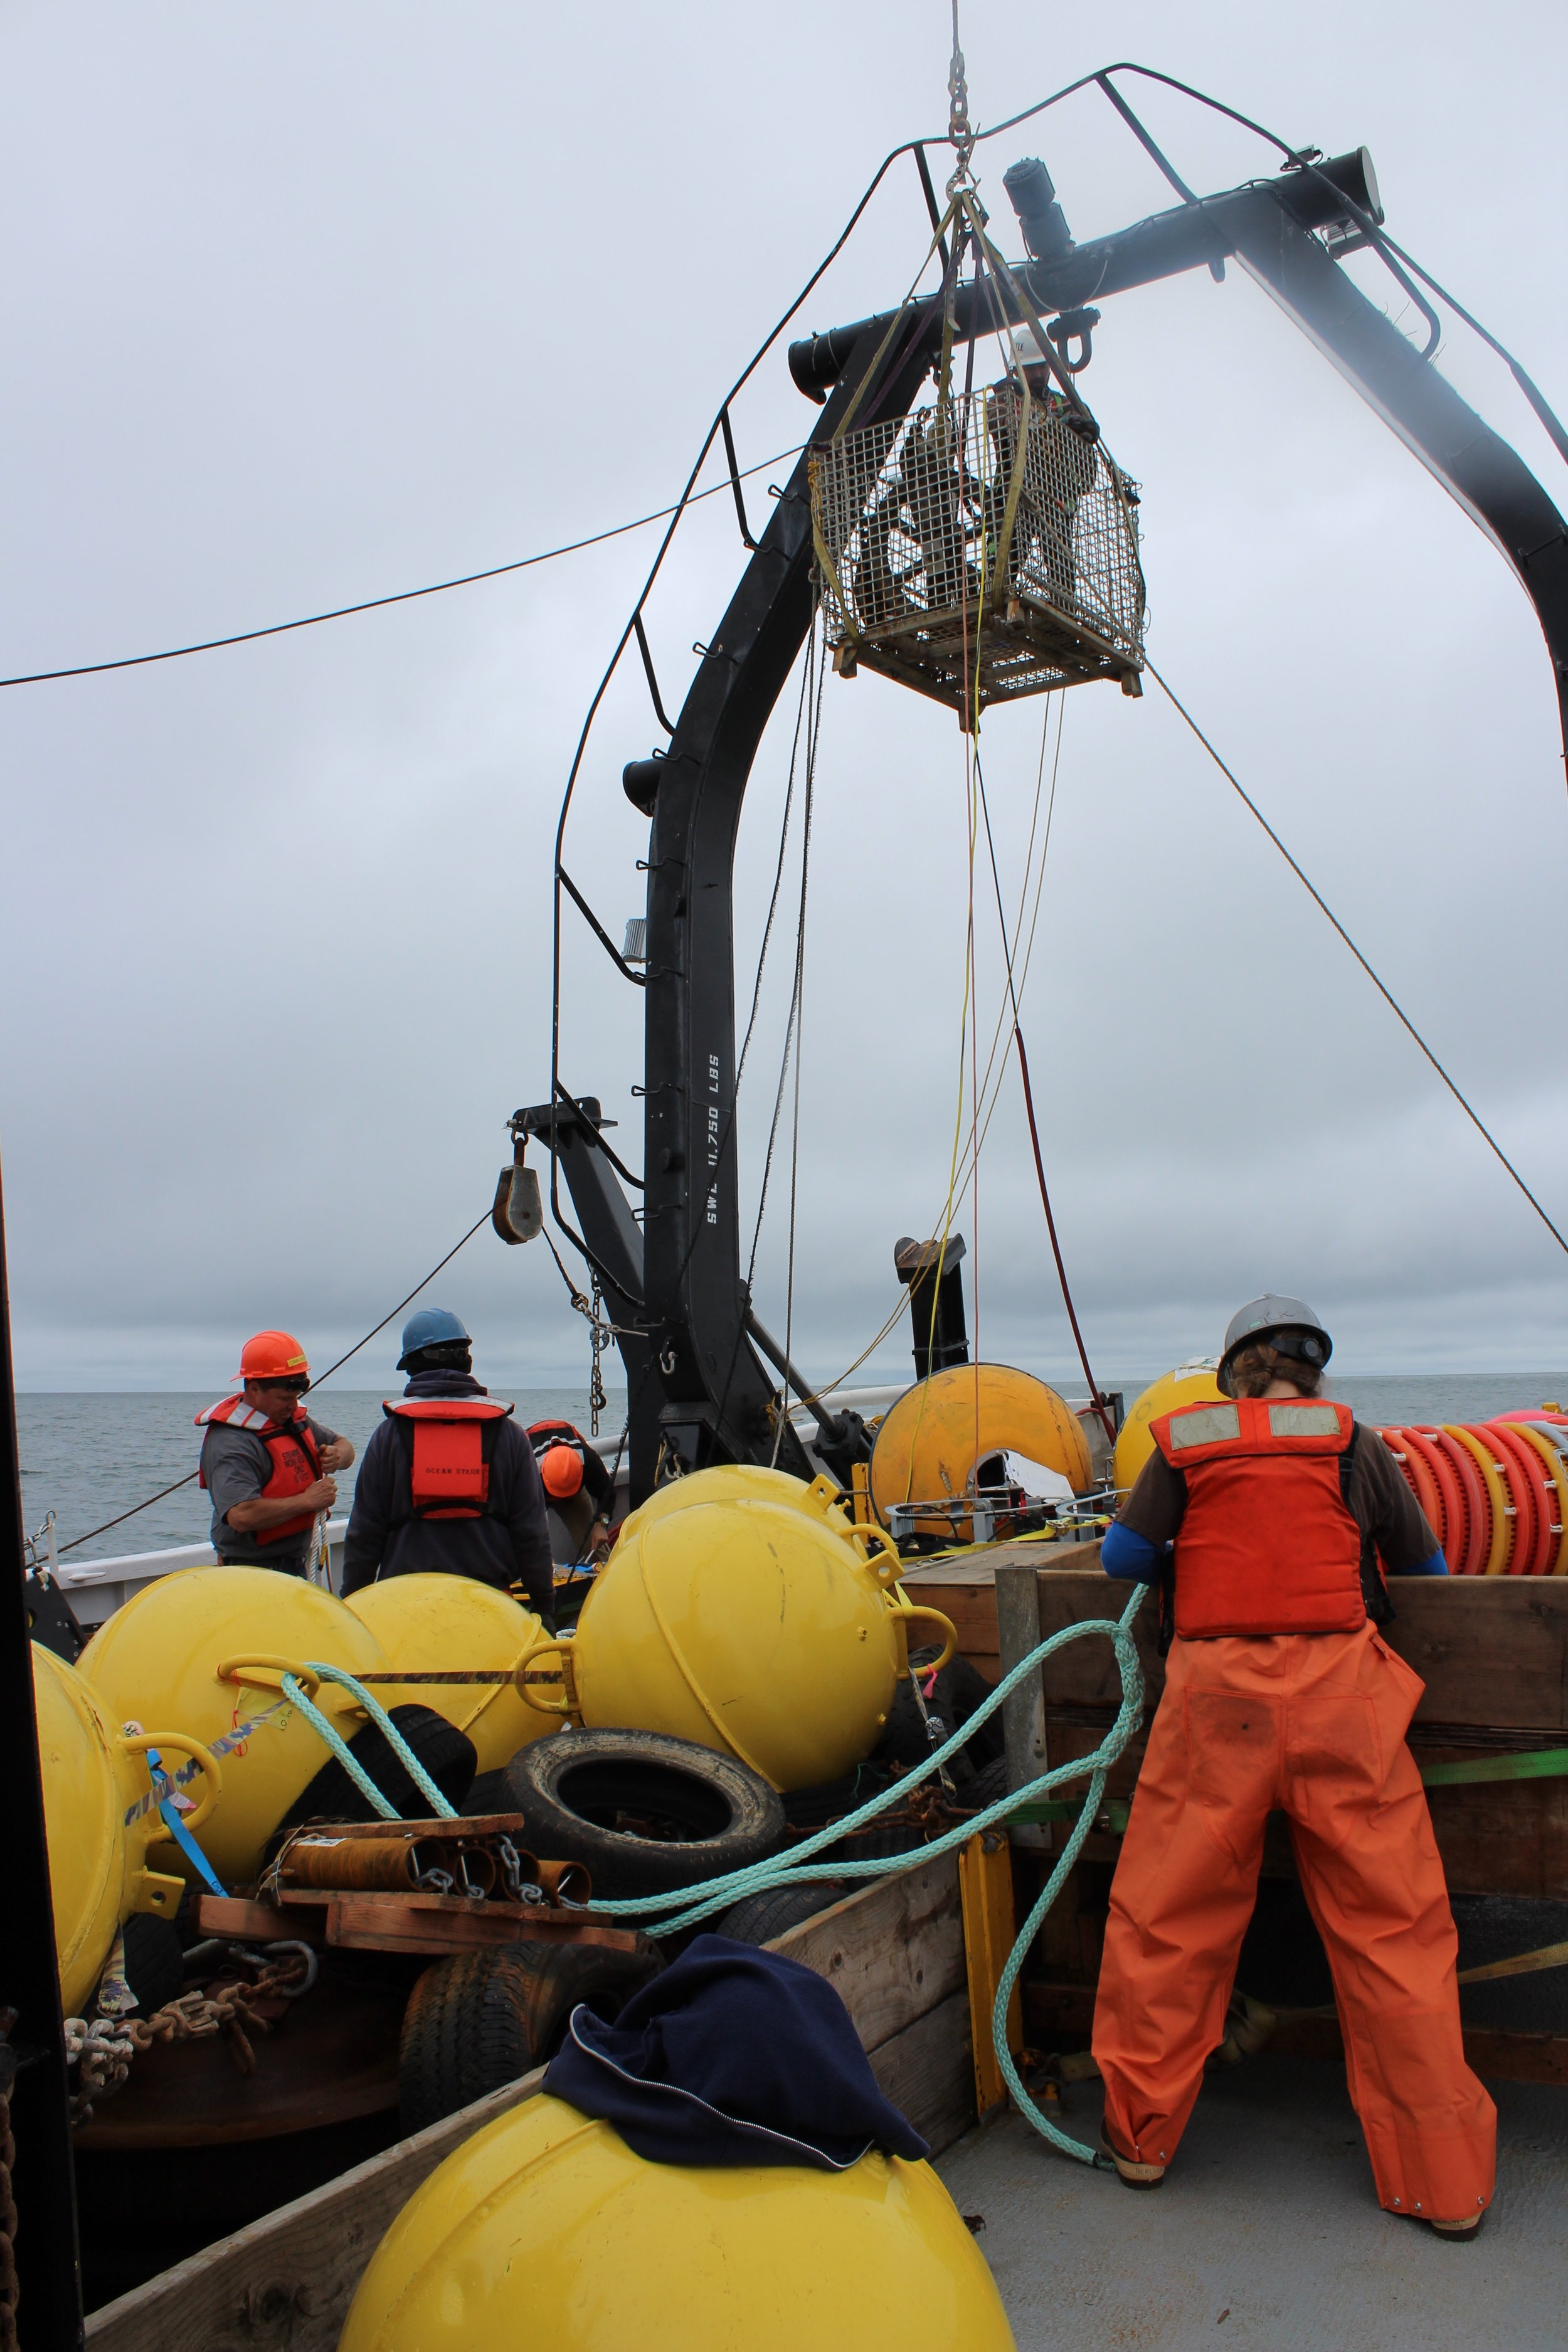 Catherine Berchok splices line for bridles of mooring buoys;Armando Urrutia repairs the A- frame;Geoff Lebon and crew prepare moorings.Photo credit: Harmony Wayner